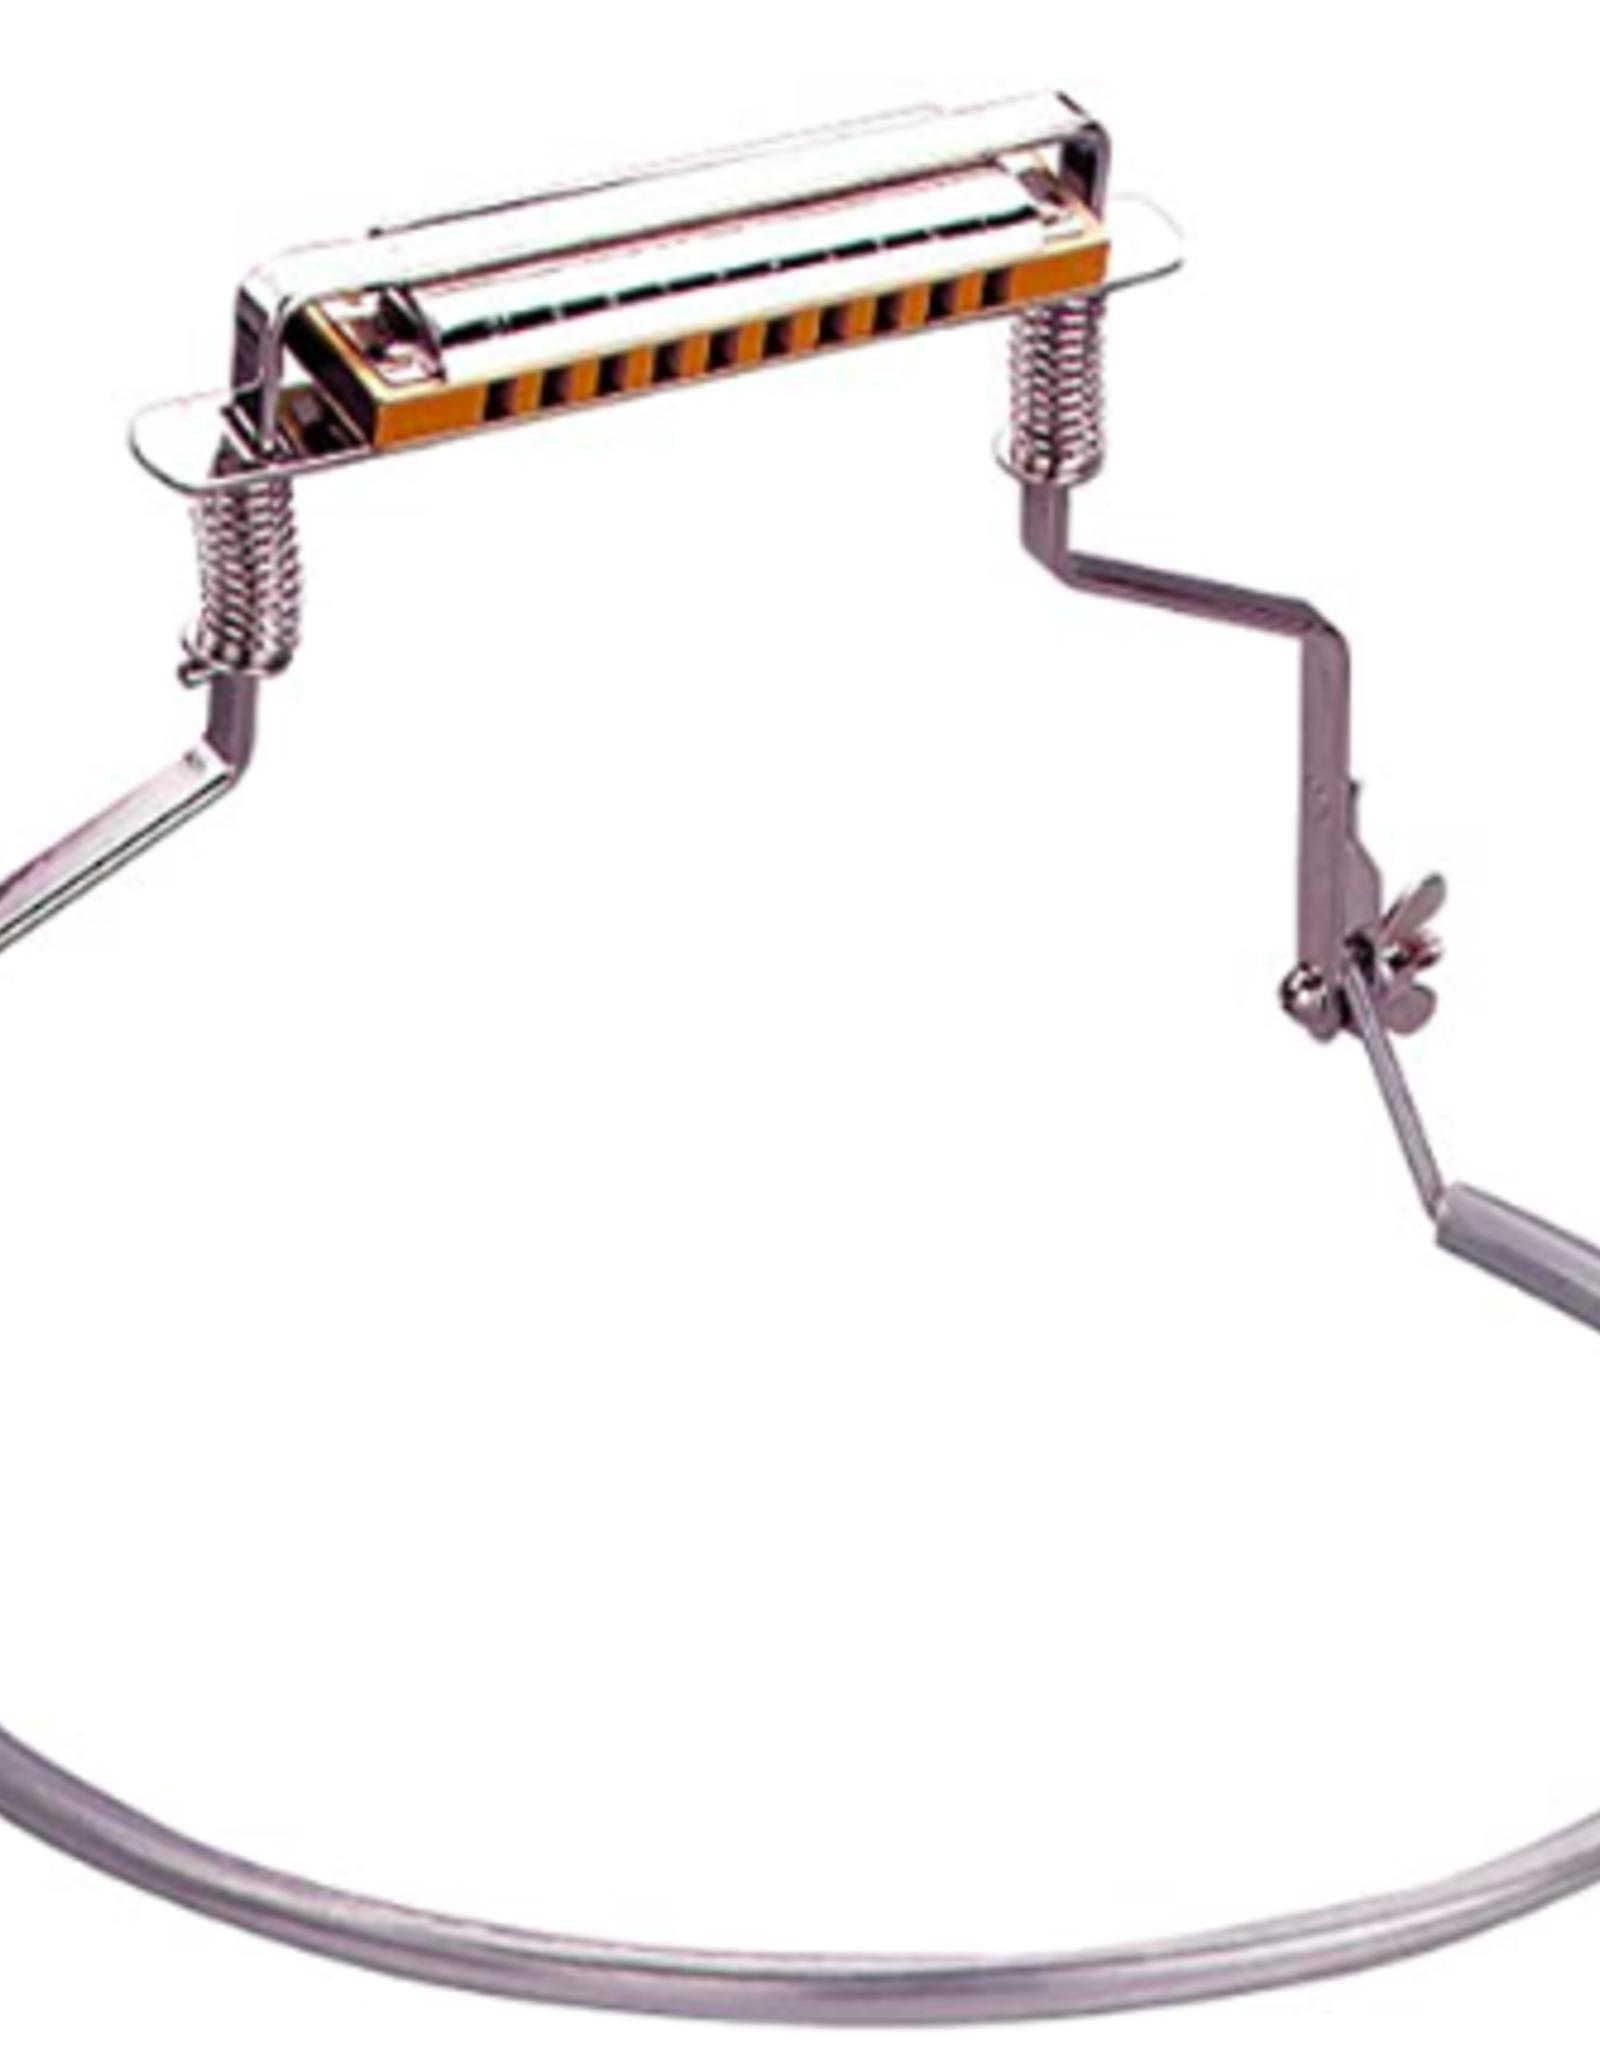 Hohner Hohner Classic 10-hole Harp Holder